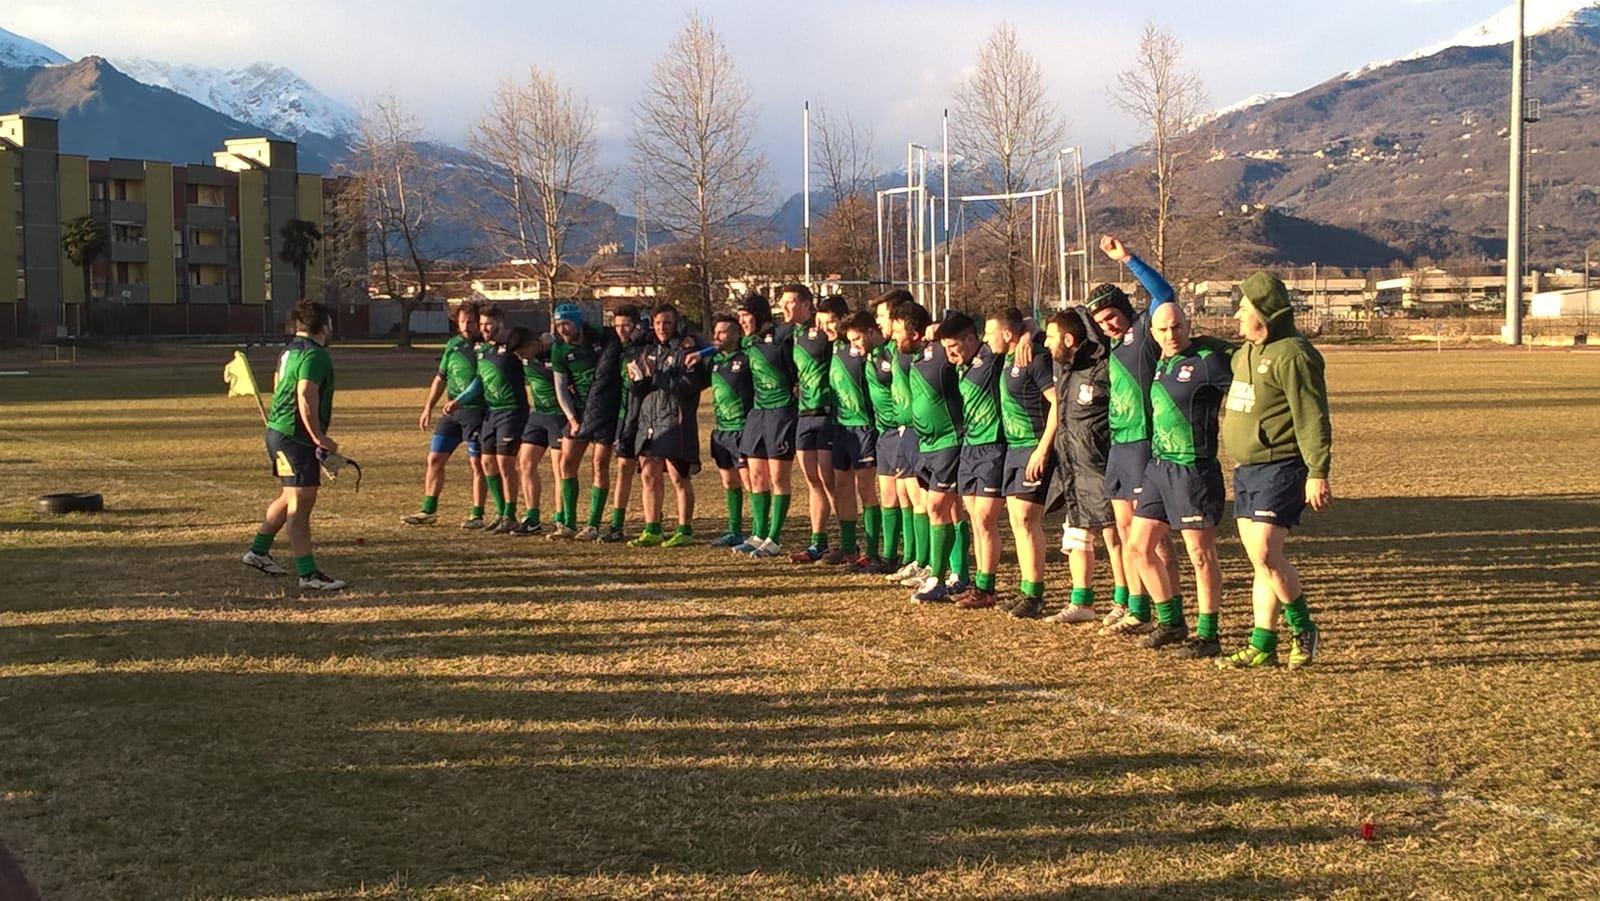 Serie C1 Girone 4 – I° Giornata II° Fase Promozione –  Ivrea Rugby Club asd – Savona Rugby  41-12 (19-5)